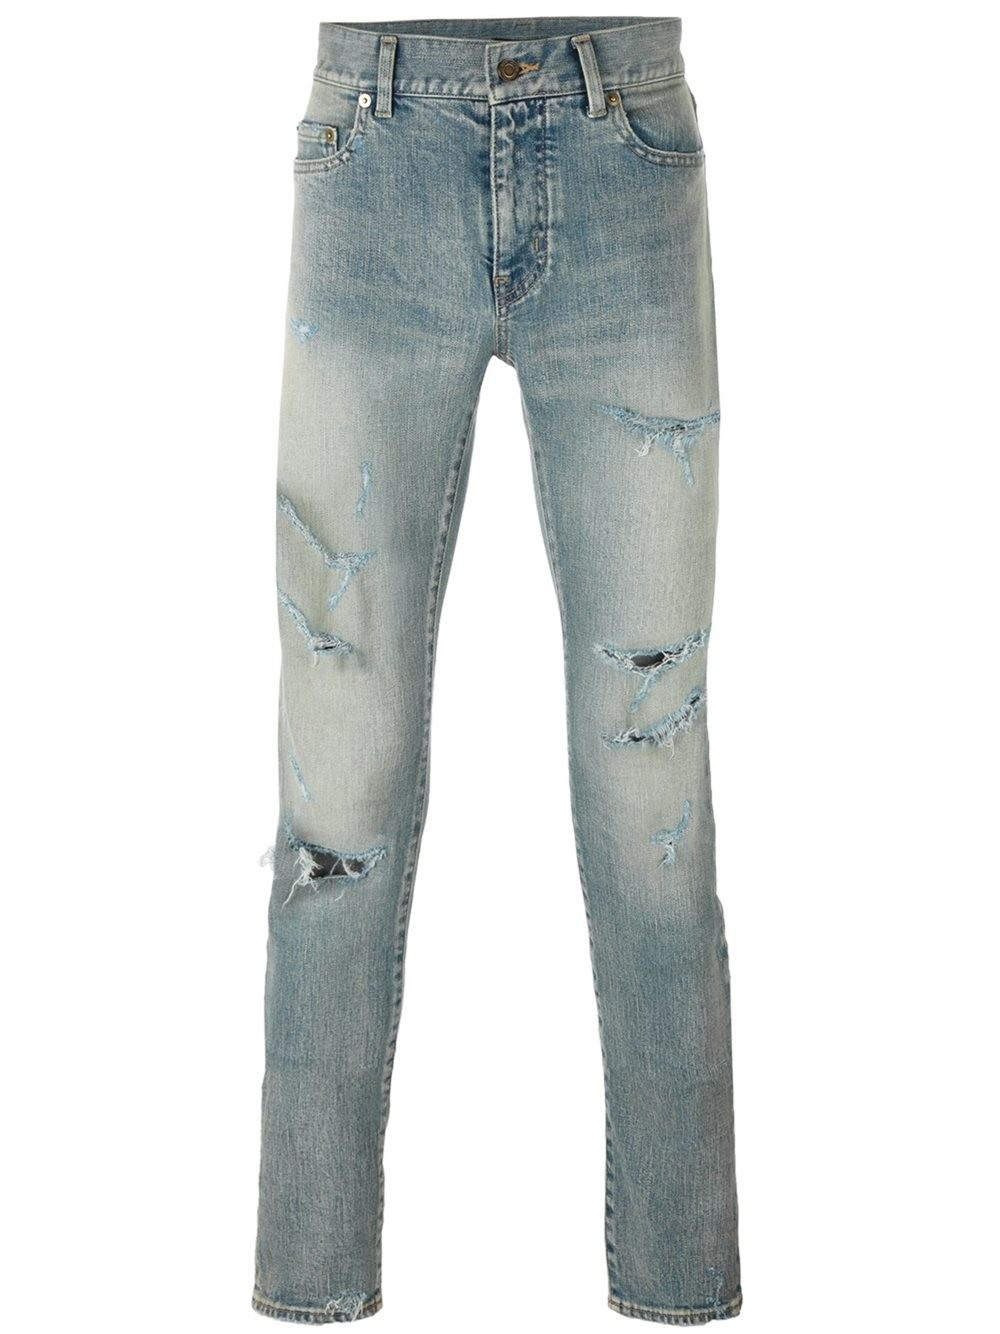 Saint Laurent Distressed Skinny Jeans In Blue